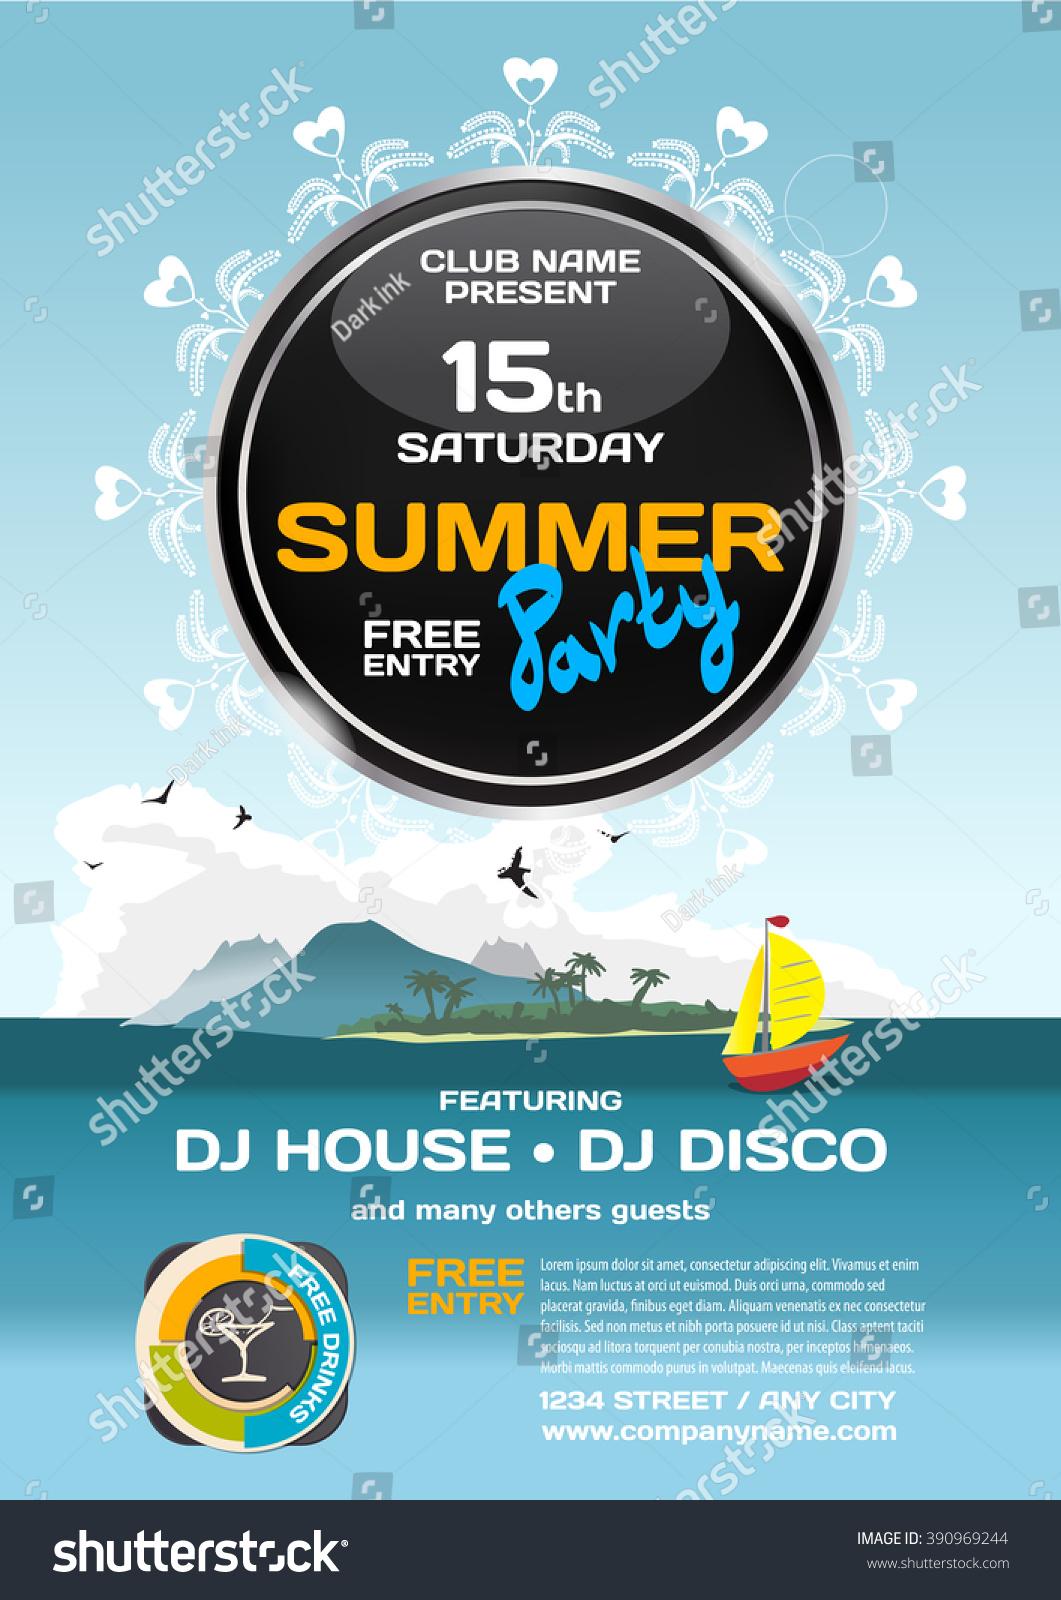 Vector summer party invitation disco style stock vector 390969244 vector summer party invitation disco style stock vector 390969244 shutterstock stopboris Choice Image